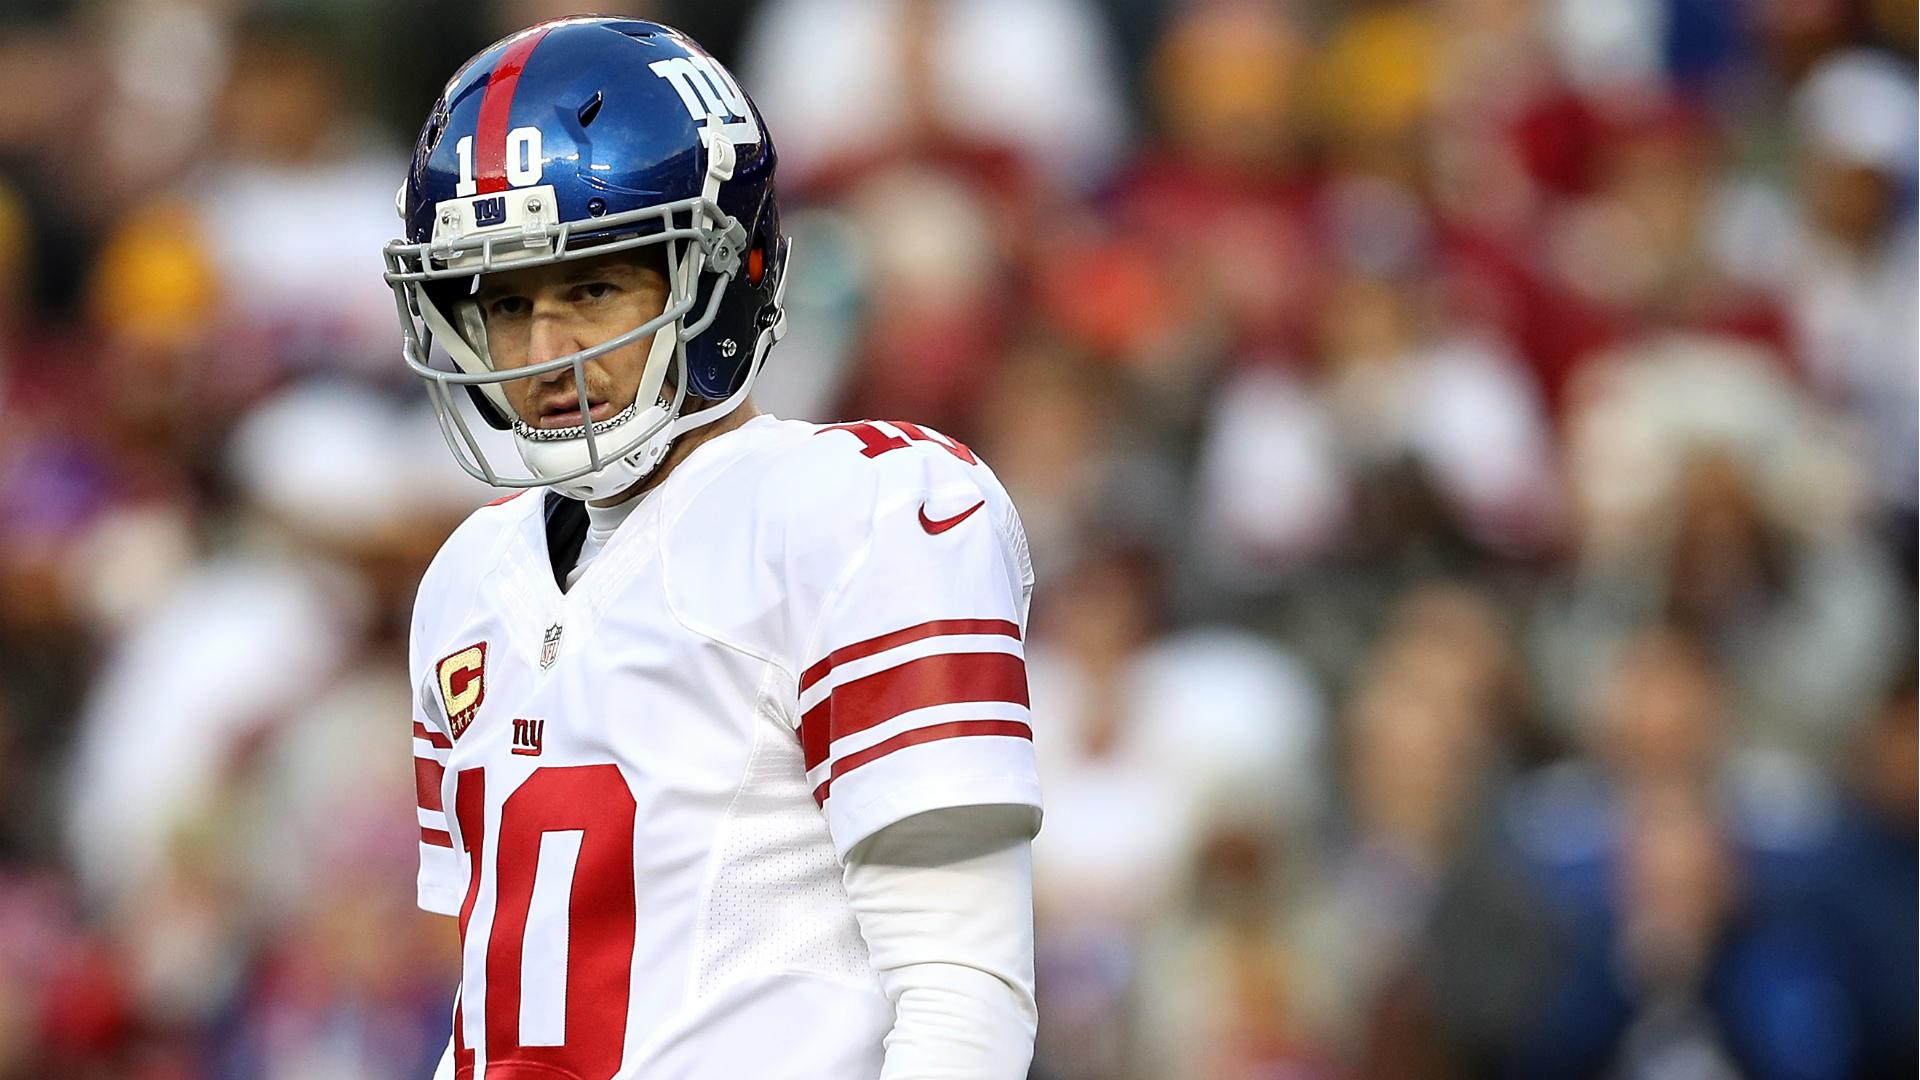 Giants to Eli Manning: Focus on performing, not Davis Webb